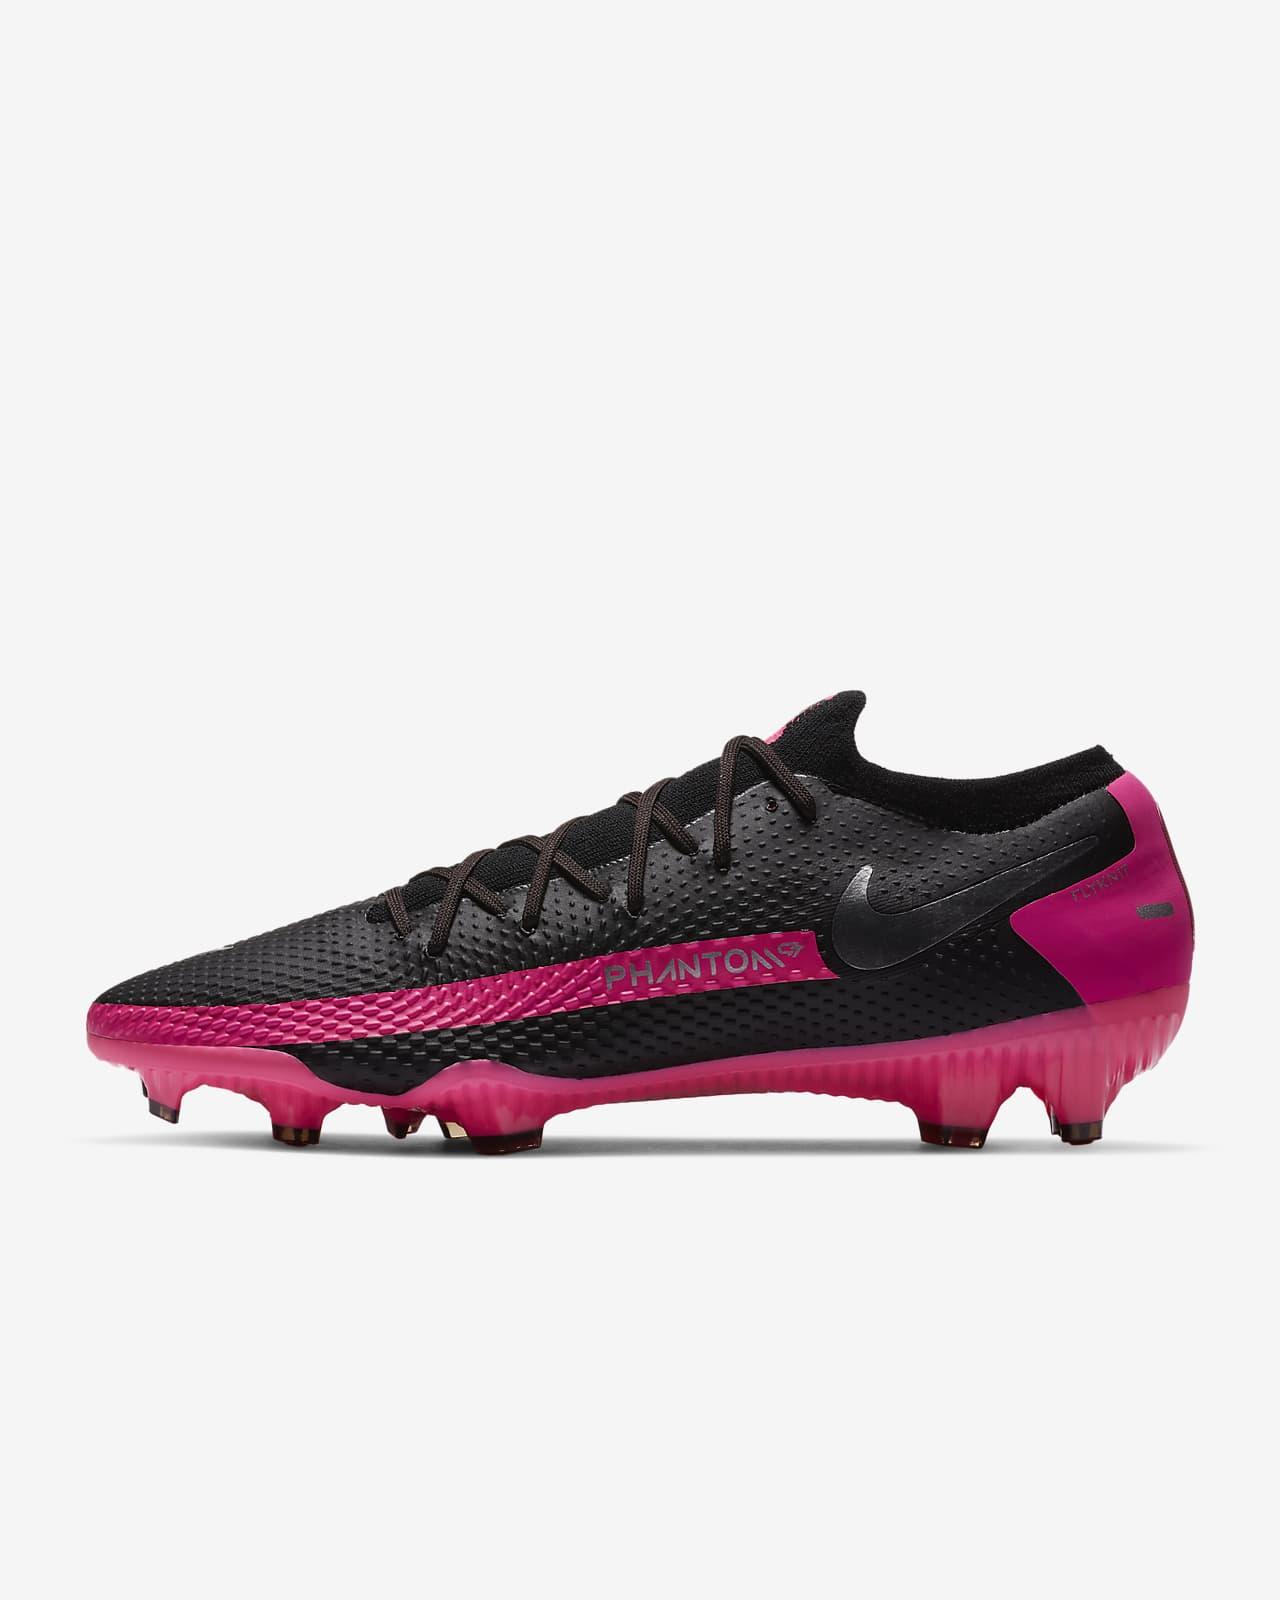 Nike Phantom GT Pro FG Firm-Ground Soccer Cleat